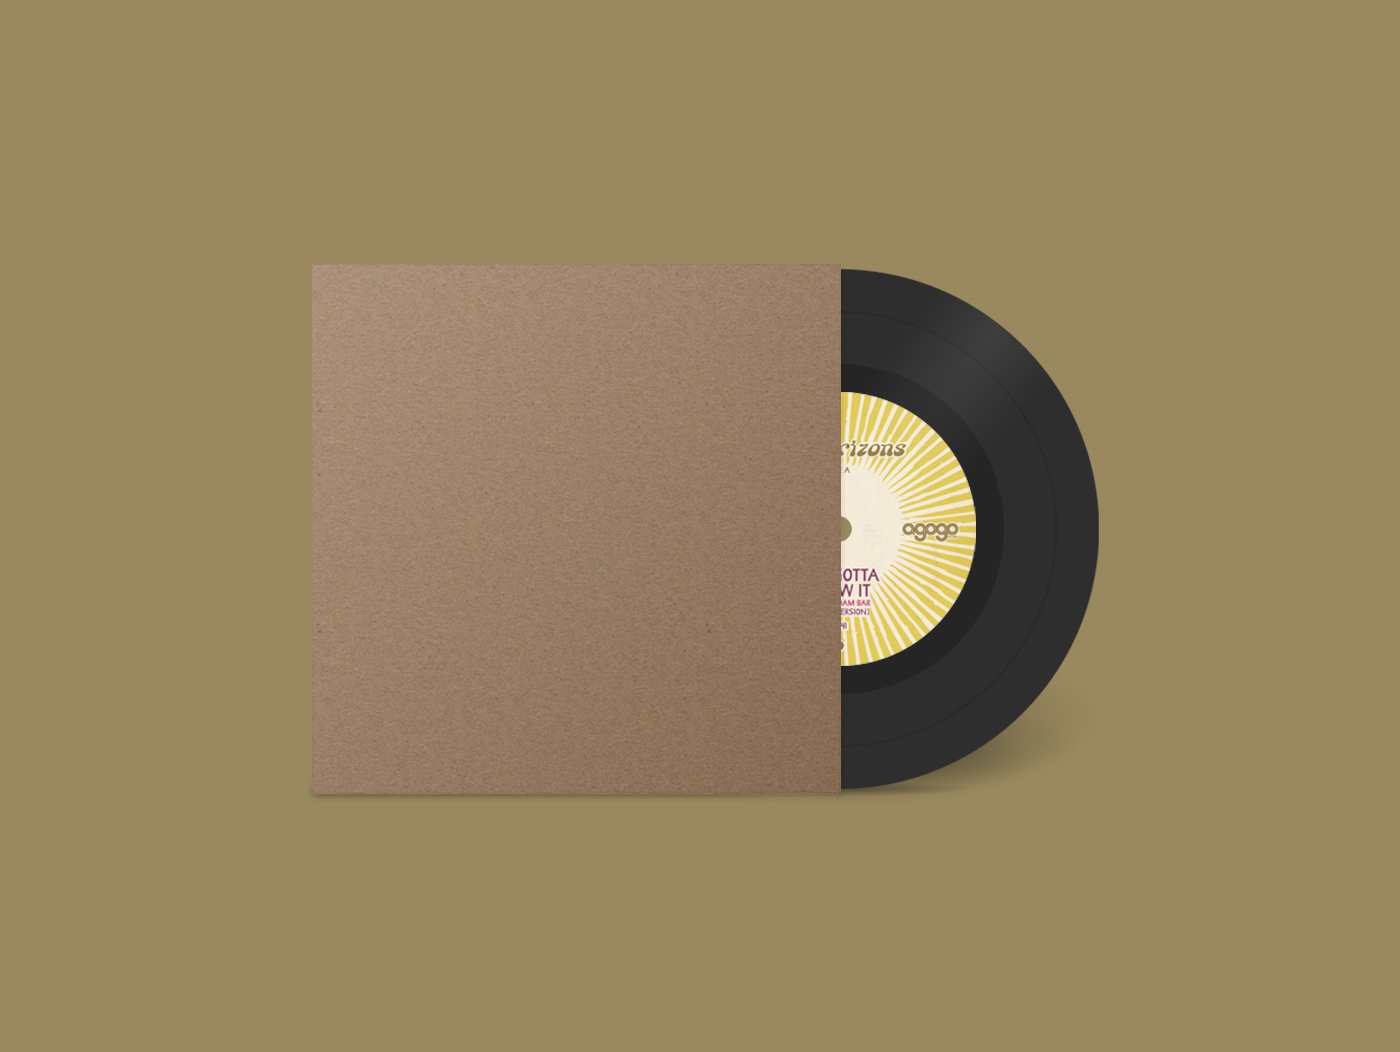 Bandcamp Vinyl 7